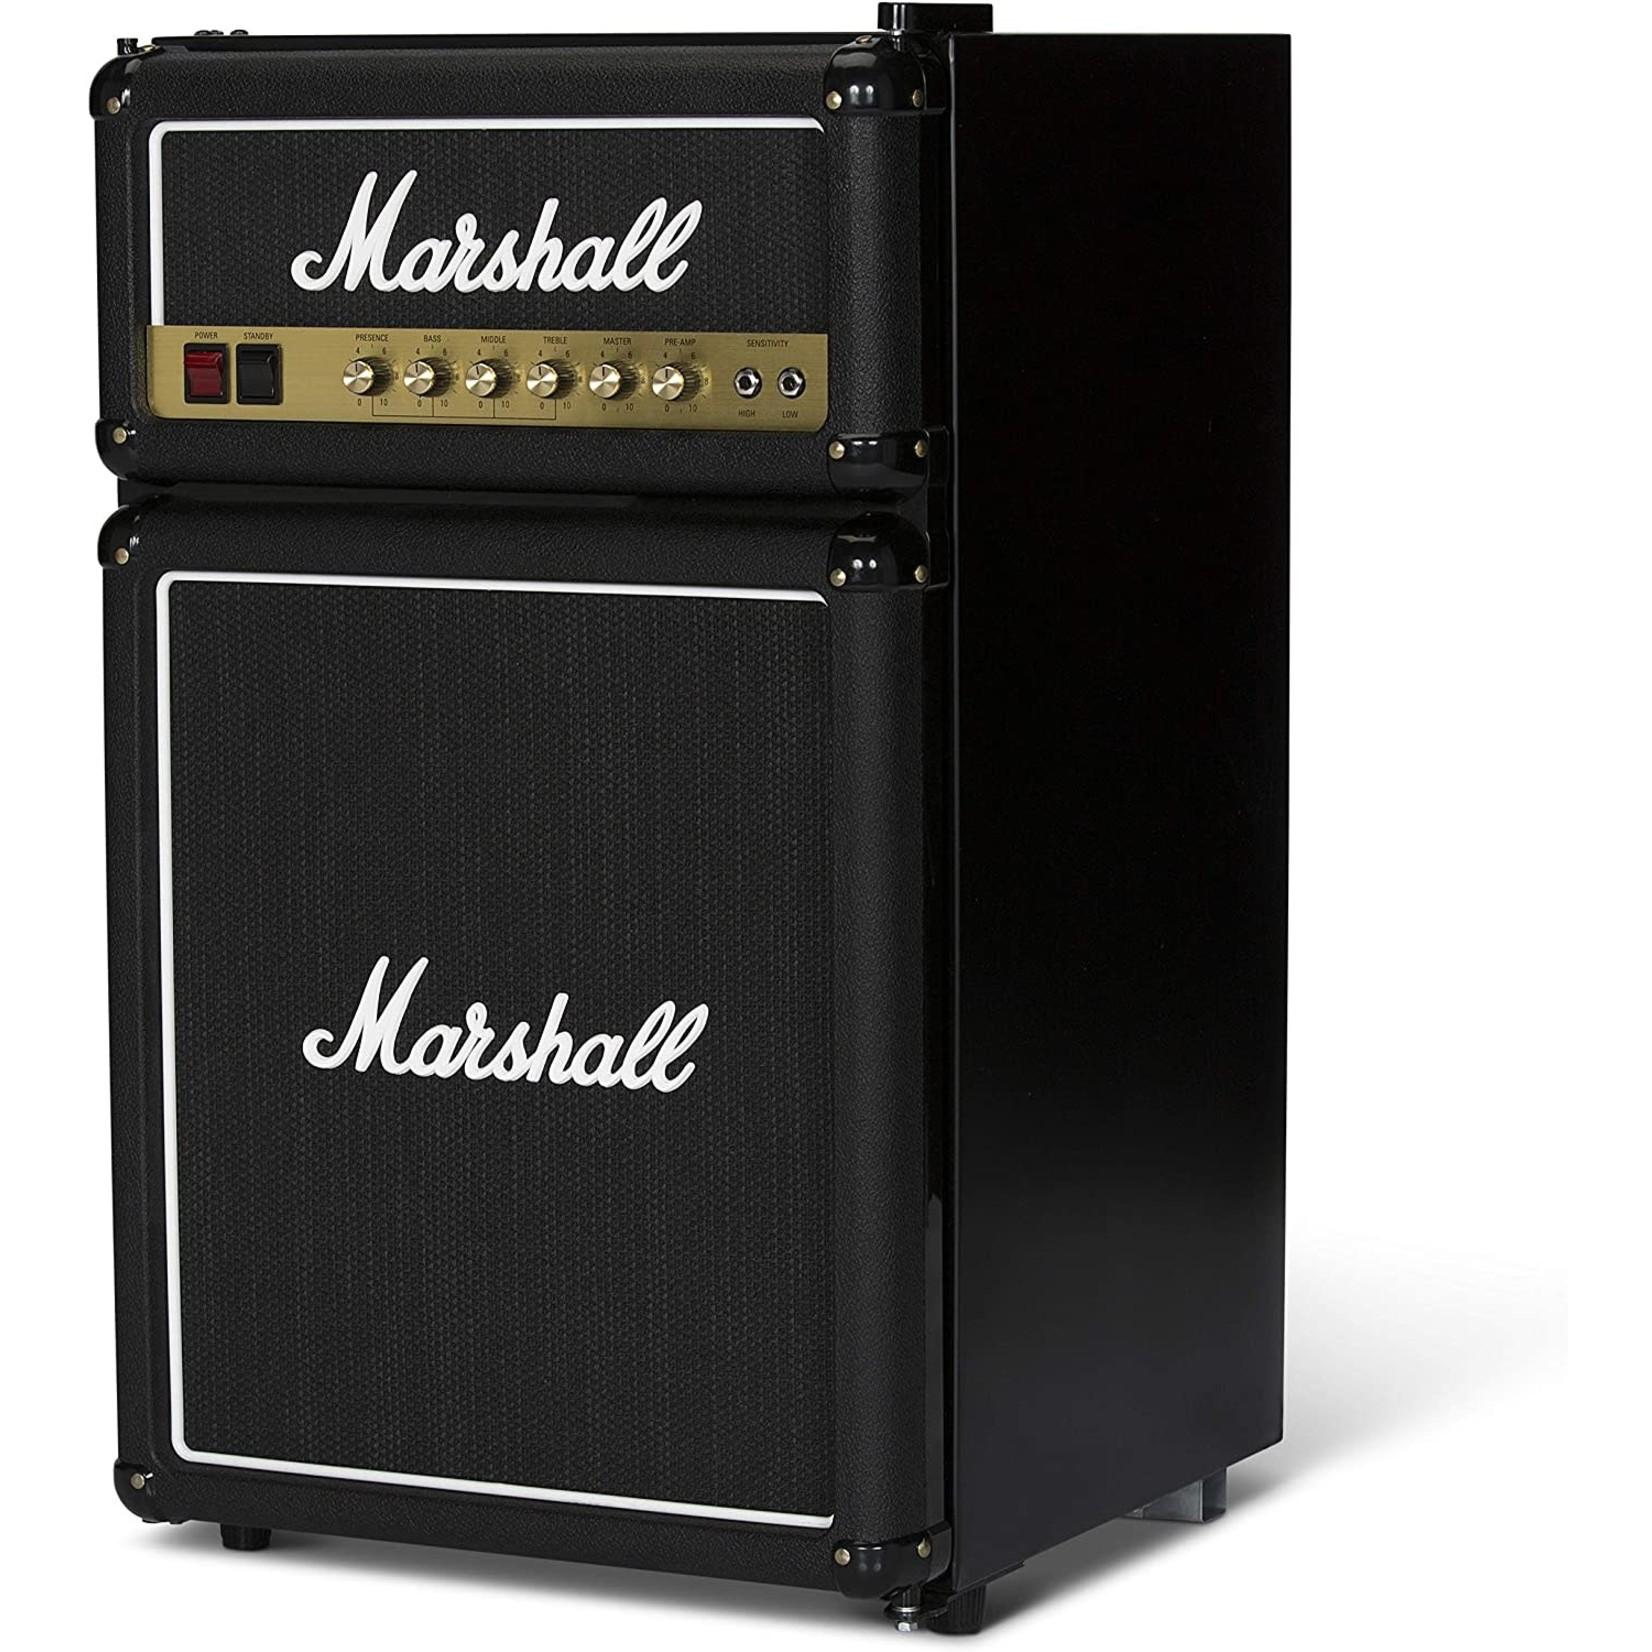 MARSHALL Black Edition 4.4 Marshall High Capacity Bar Fridge